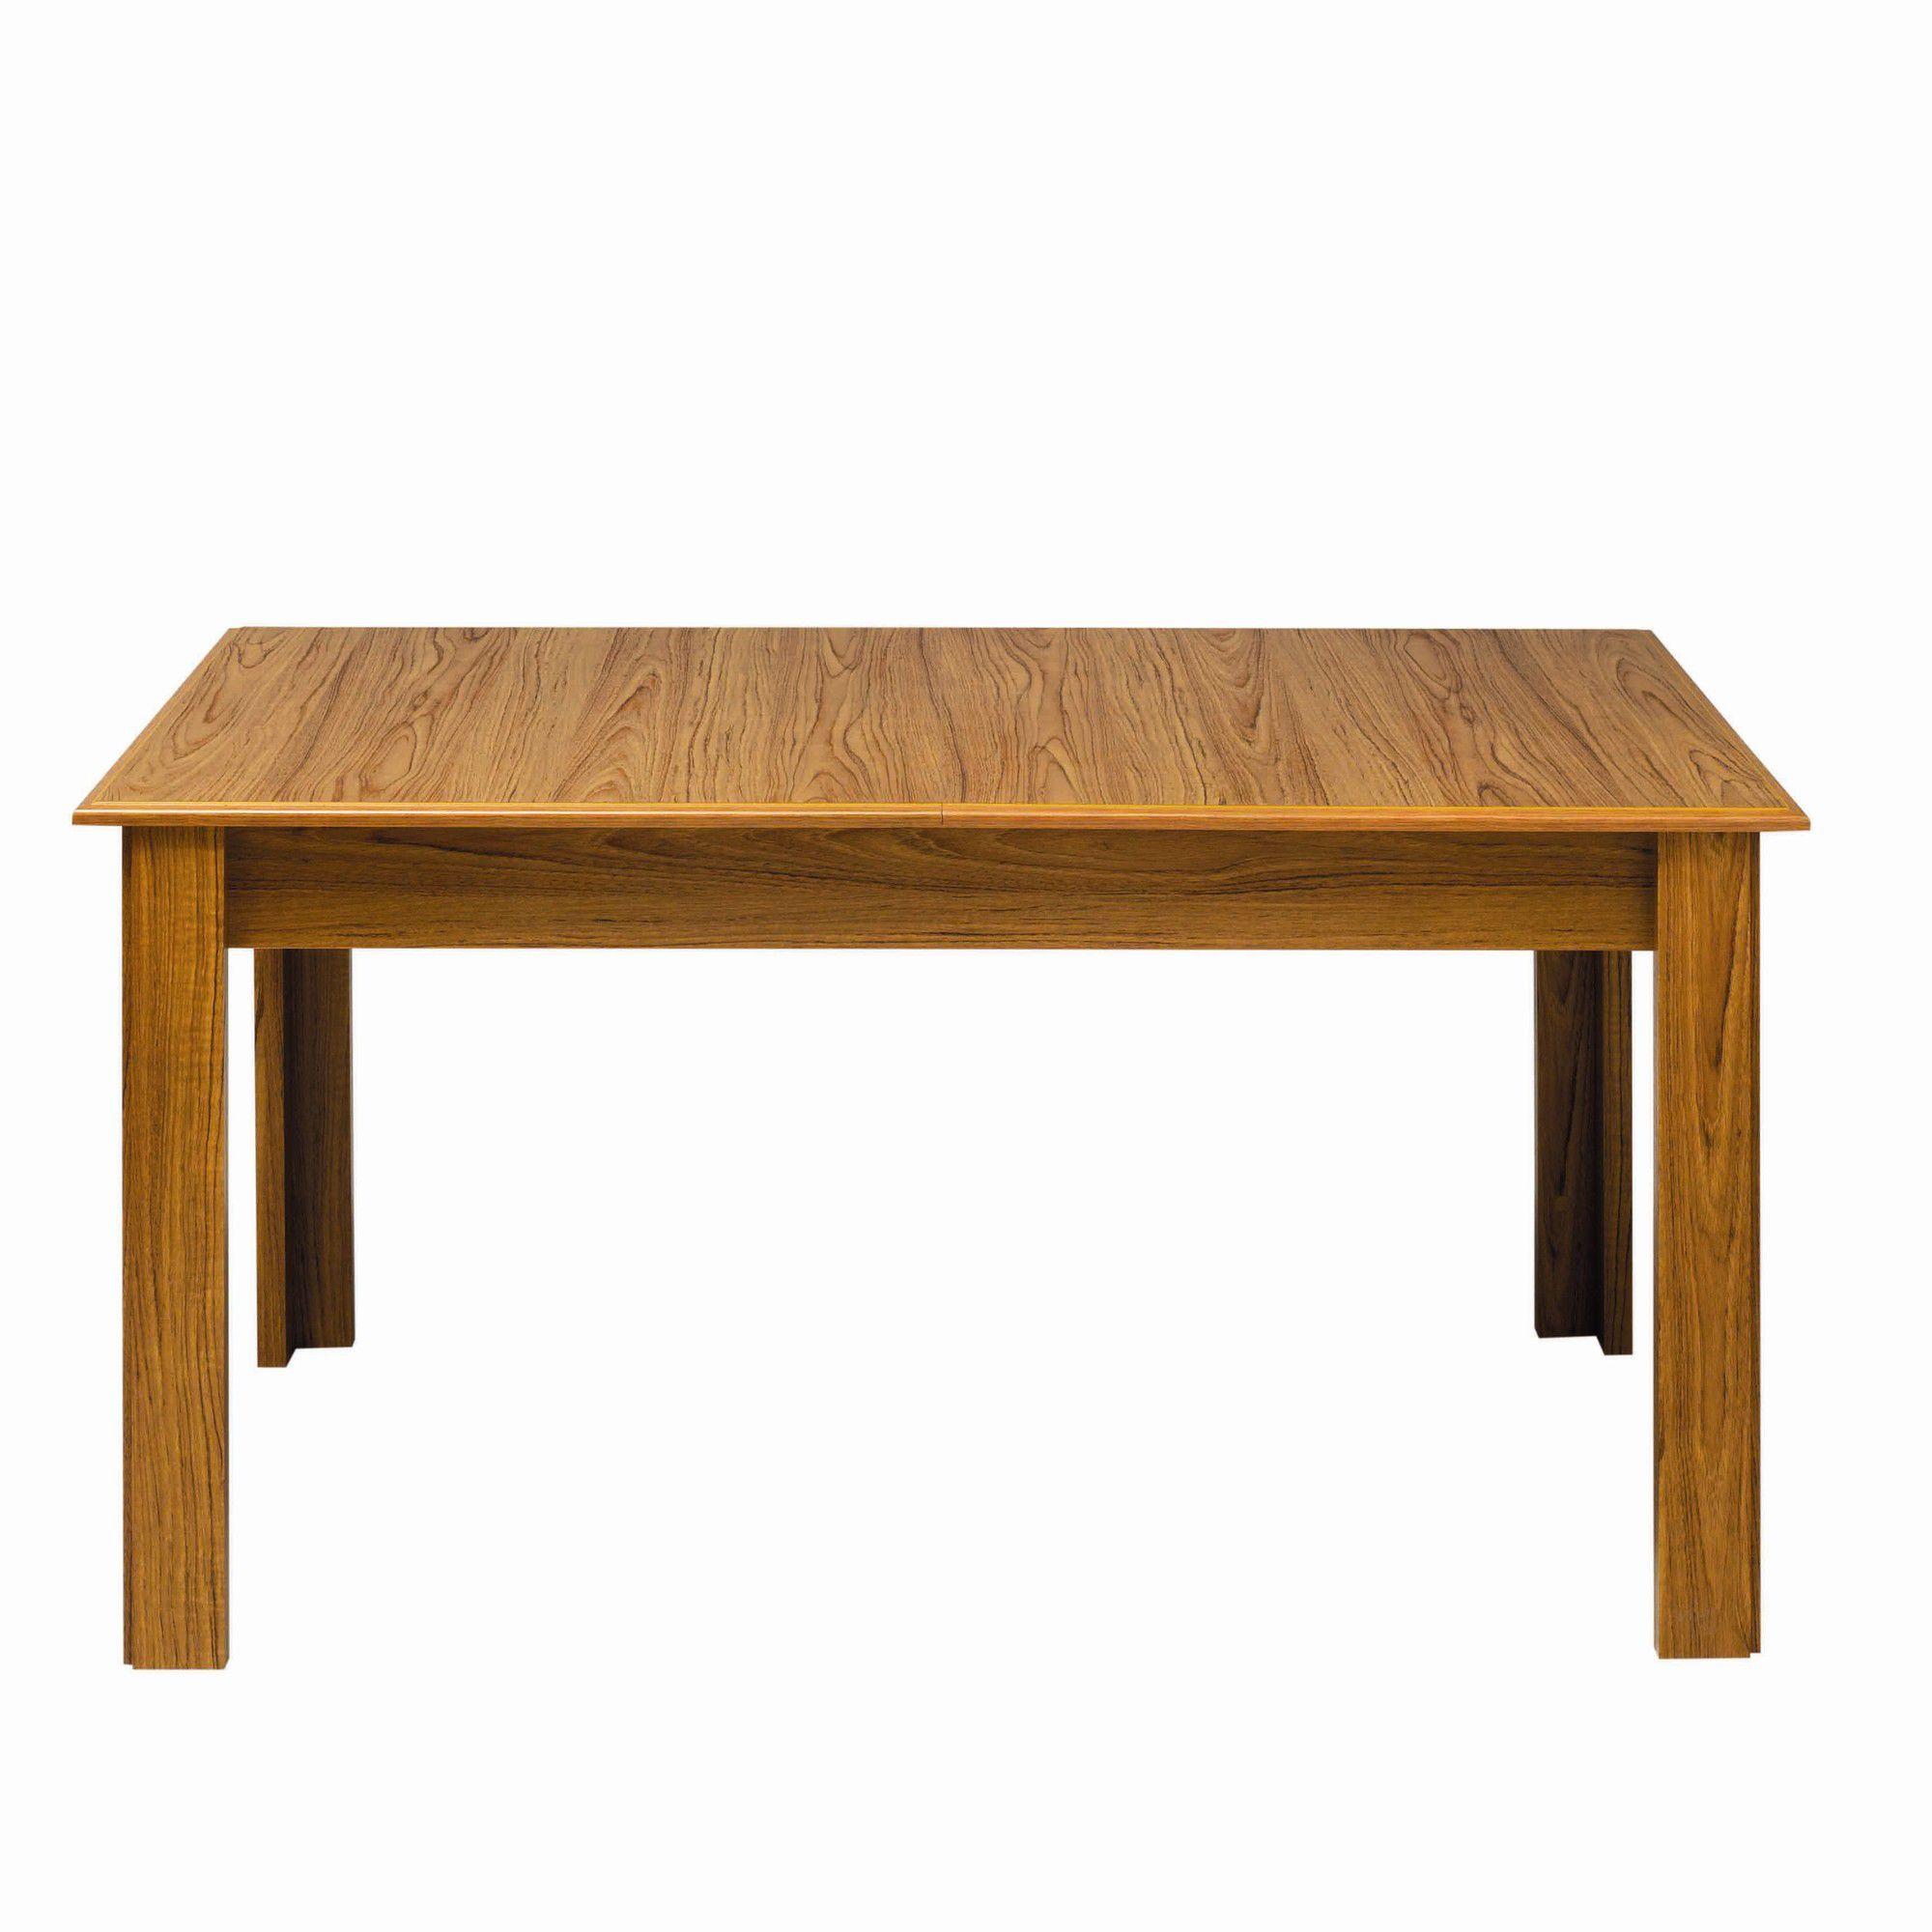 Extending Table 187 Tesco Extending Tables : 384 3943PI1000015MNwid2000amphei2000 from extendingtable.co.uk size 2000 x 2000 jpeg 190kB